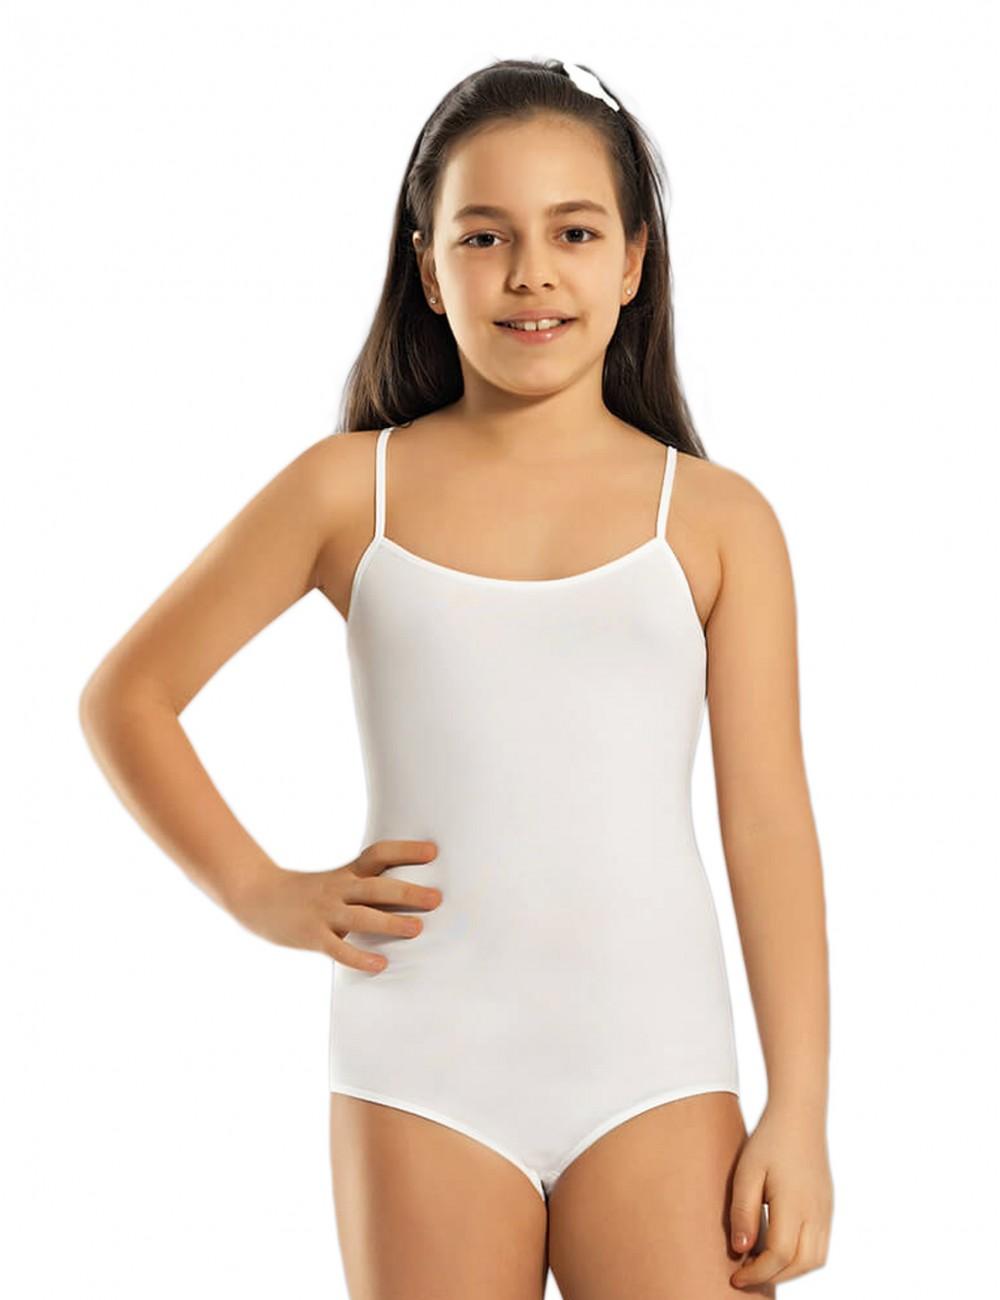 73dcc7199c9 Βαμβακερό Κορμάκι με λεπτή τιραντα για κορίτσια 4 έως 12 ετών-461